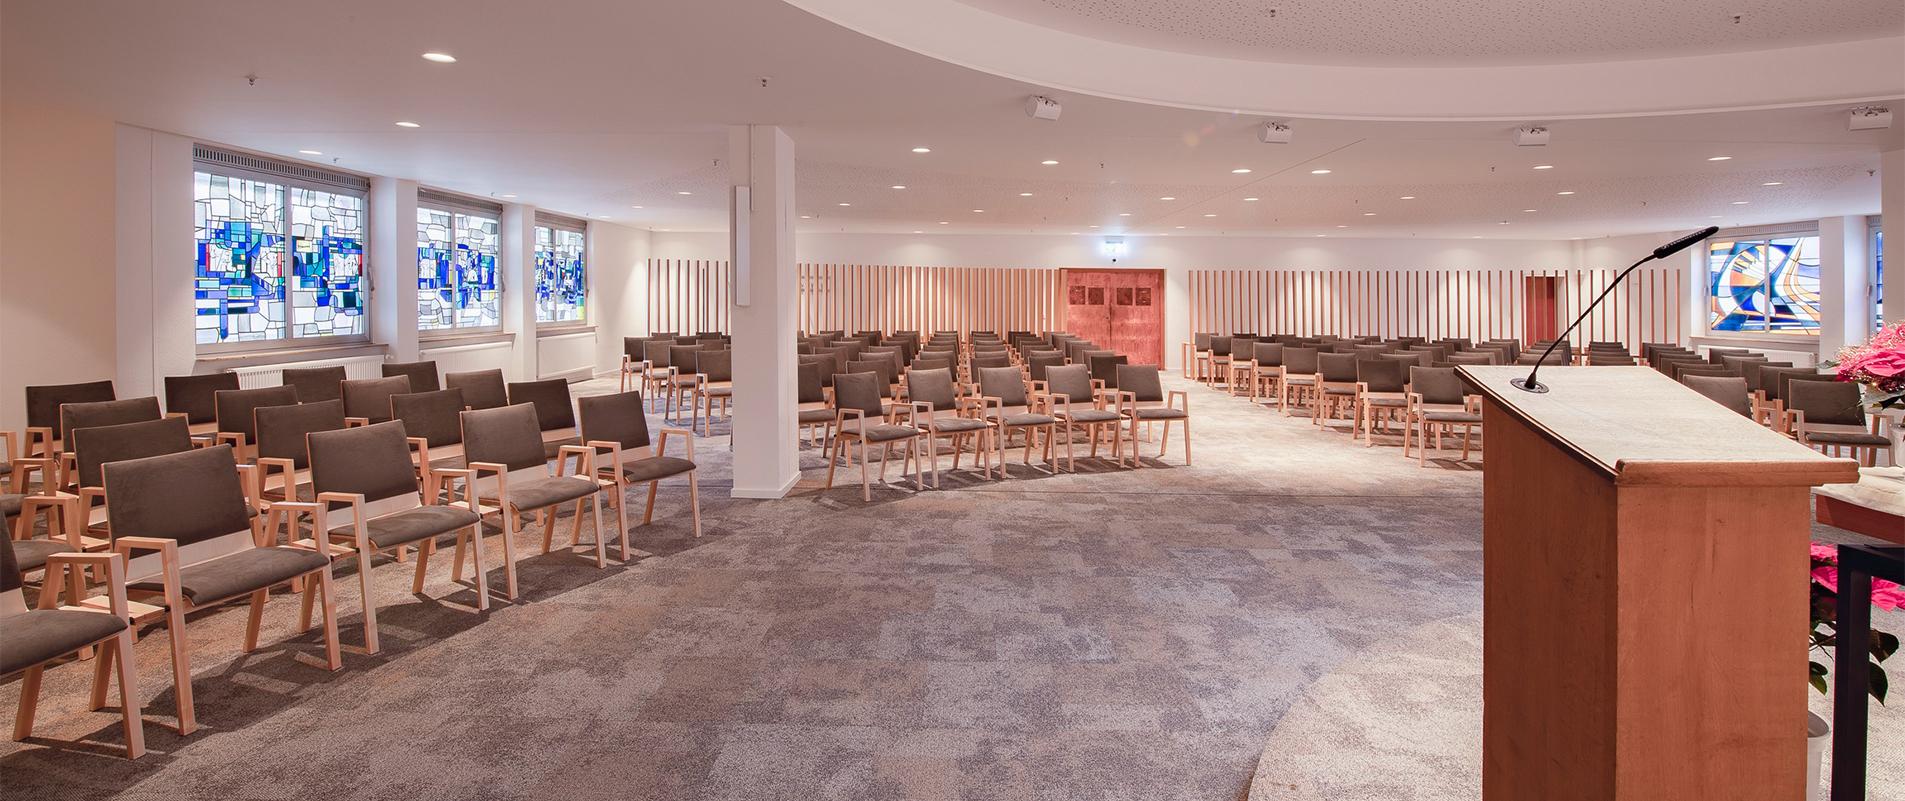 Kapelle - Wohnstift am Tiergarten